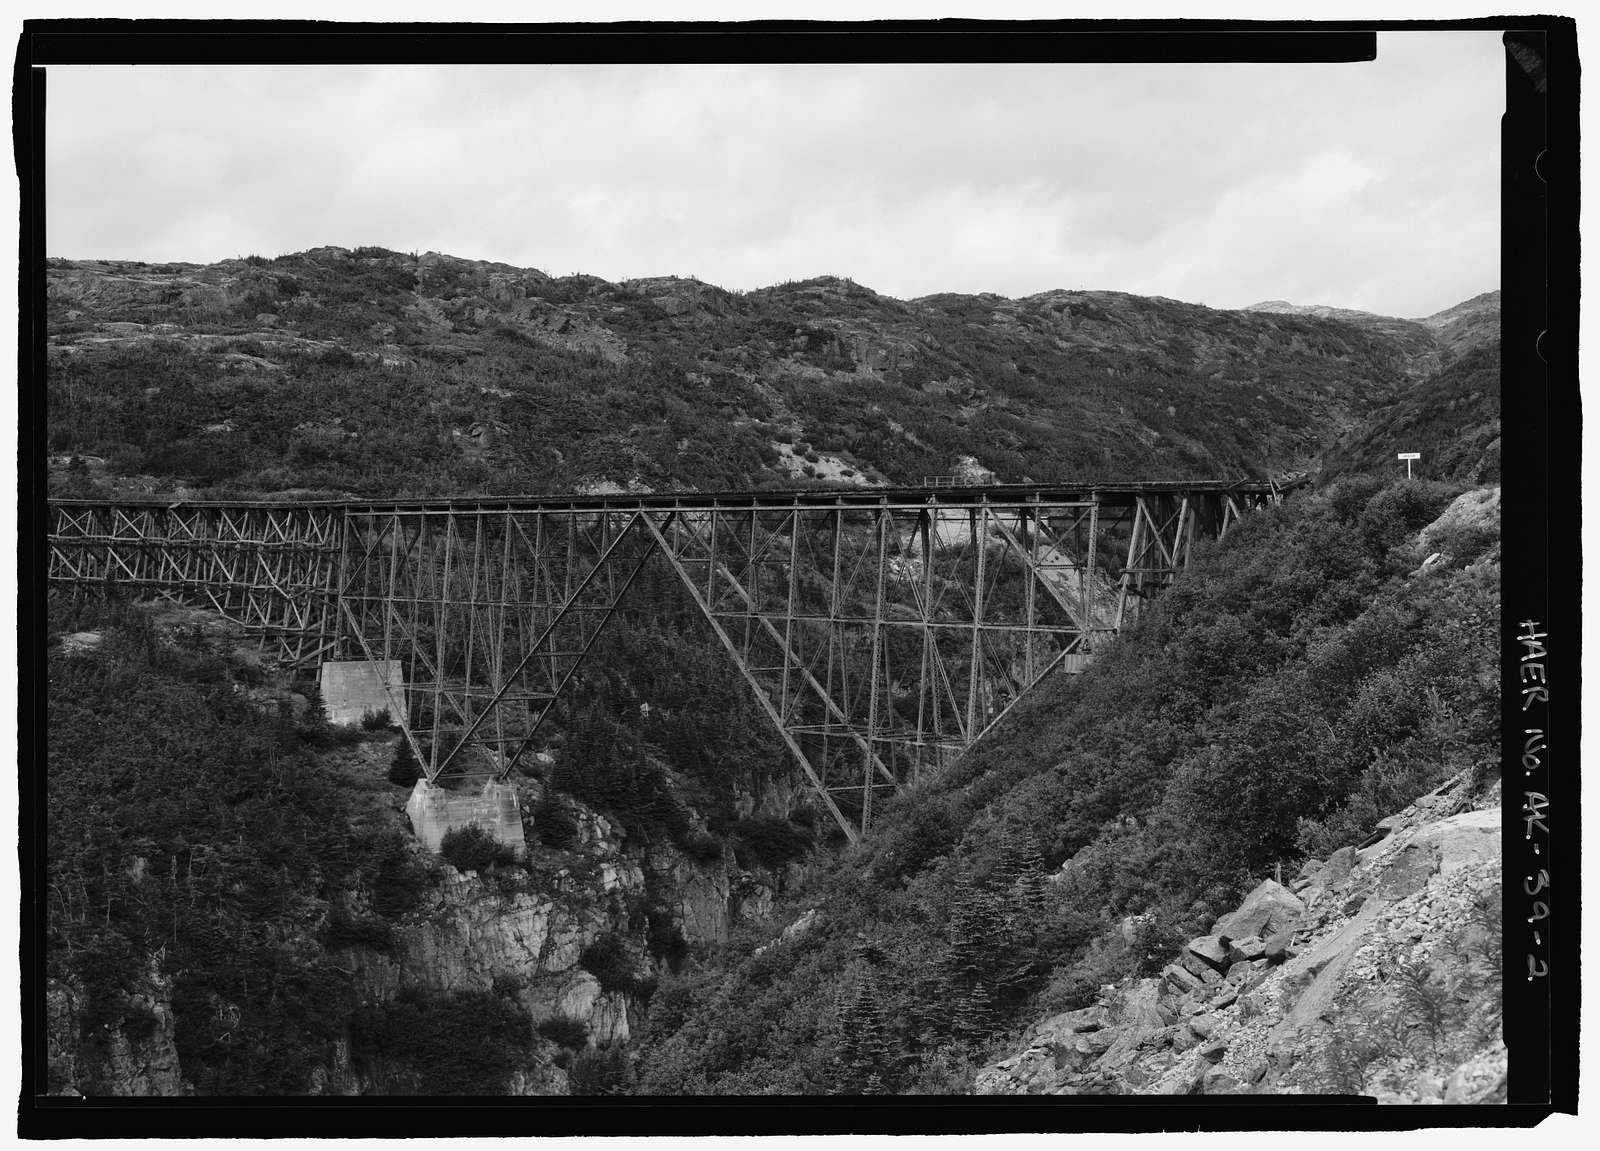 White Pass & Yukon Railroad, Cantilever Bridge, Skagway, Skagway, AK